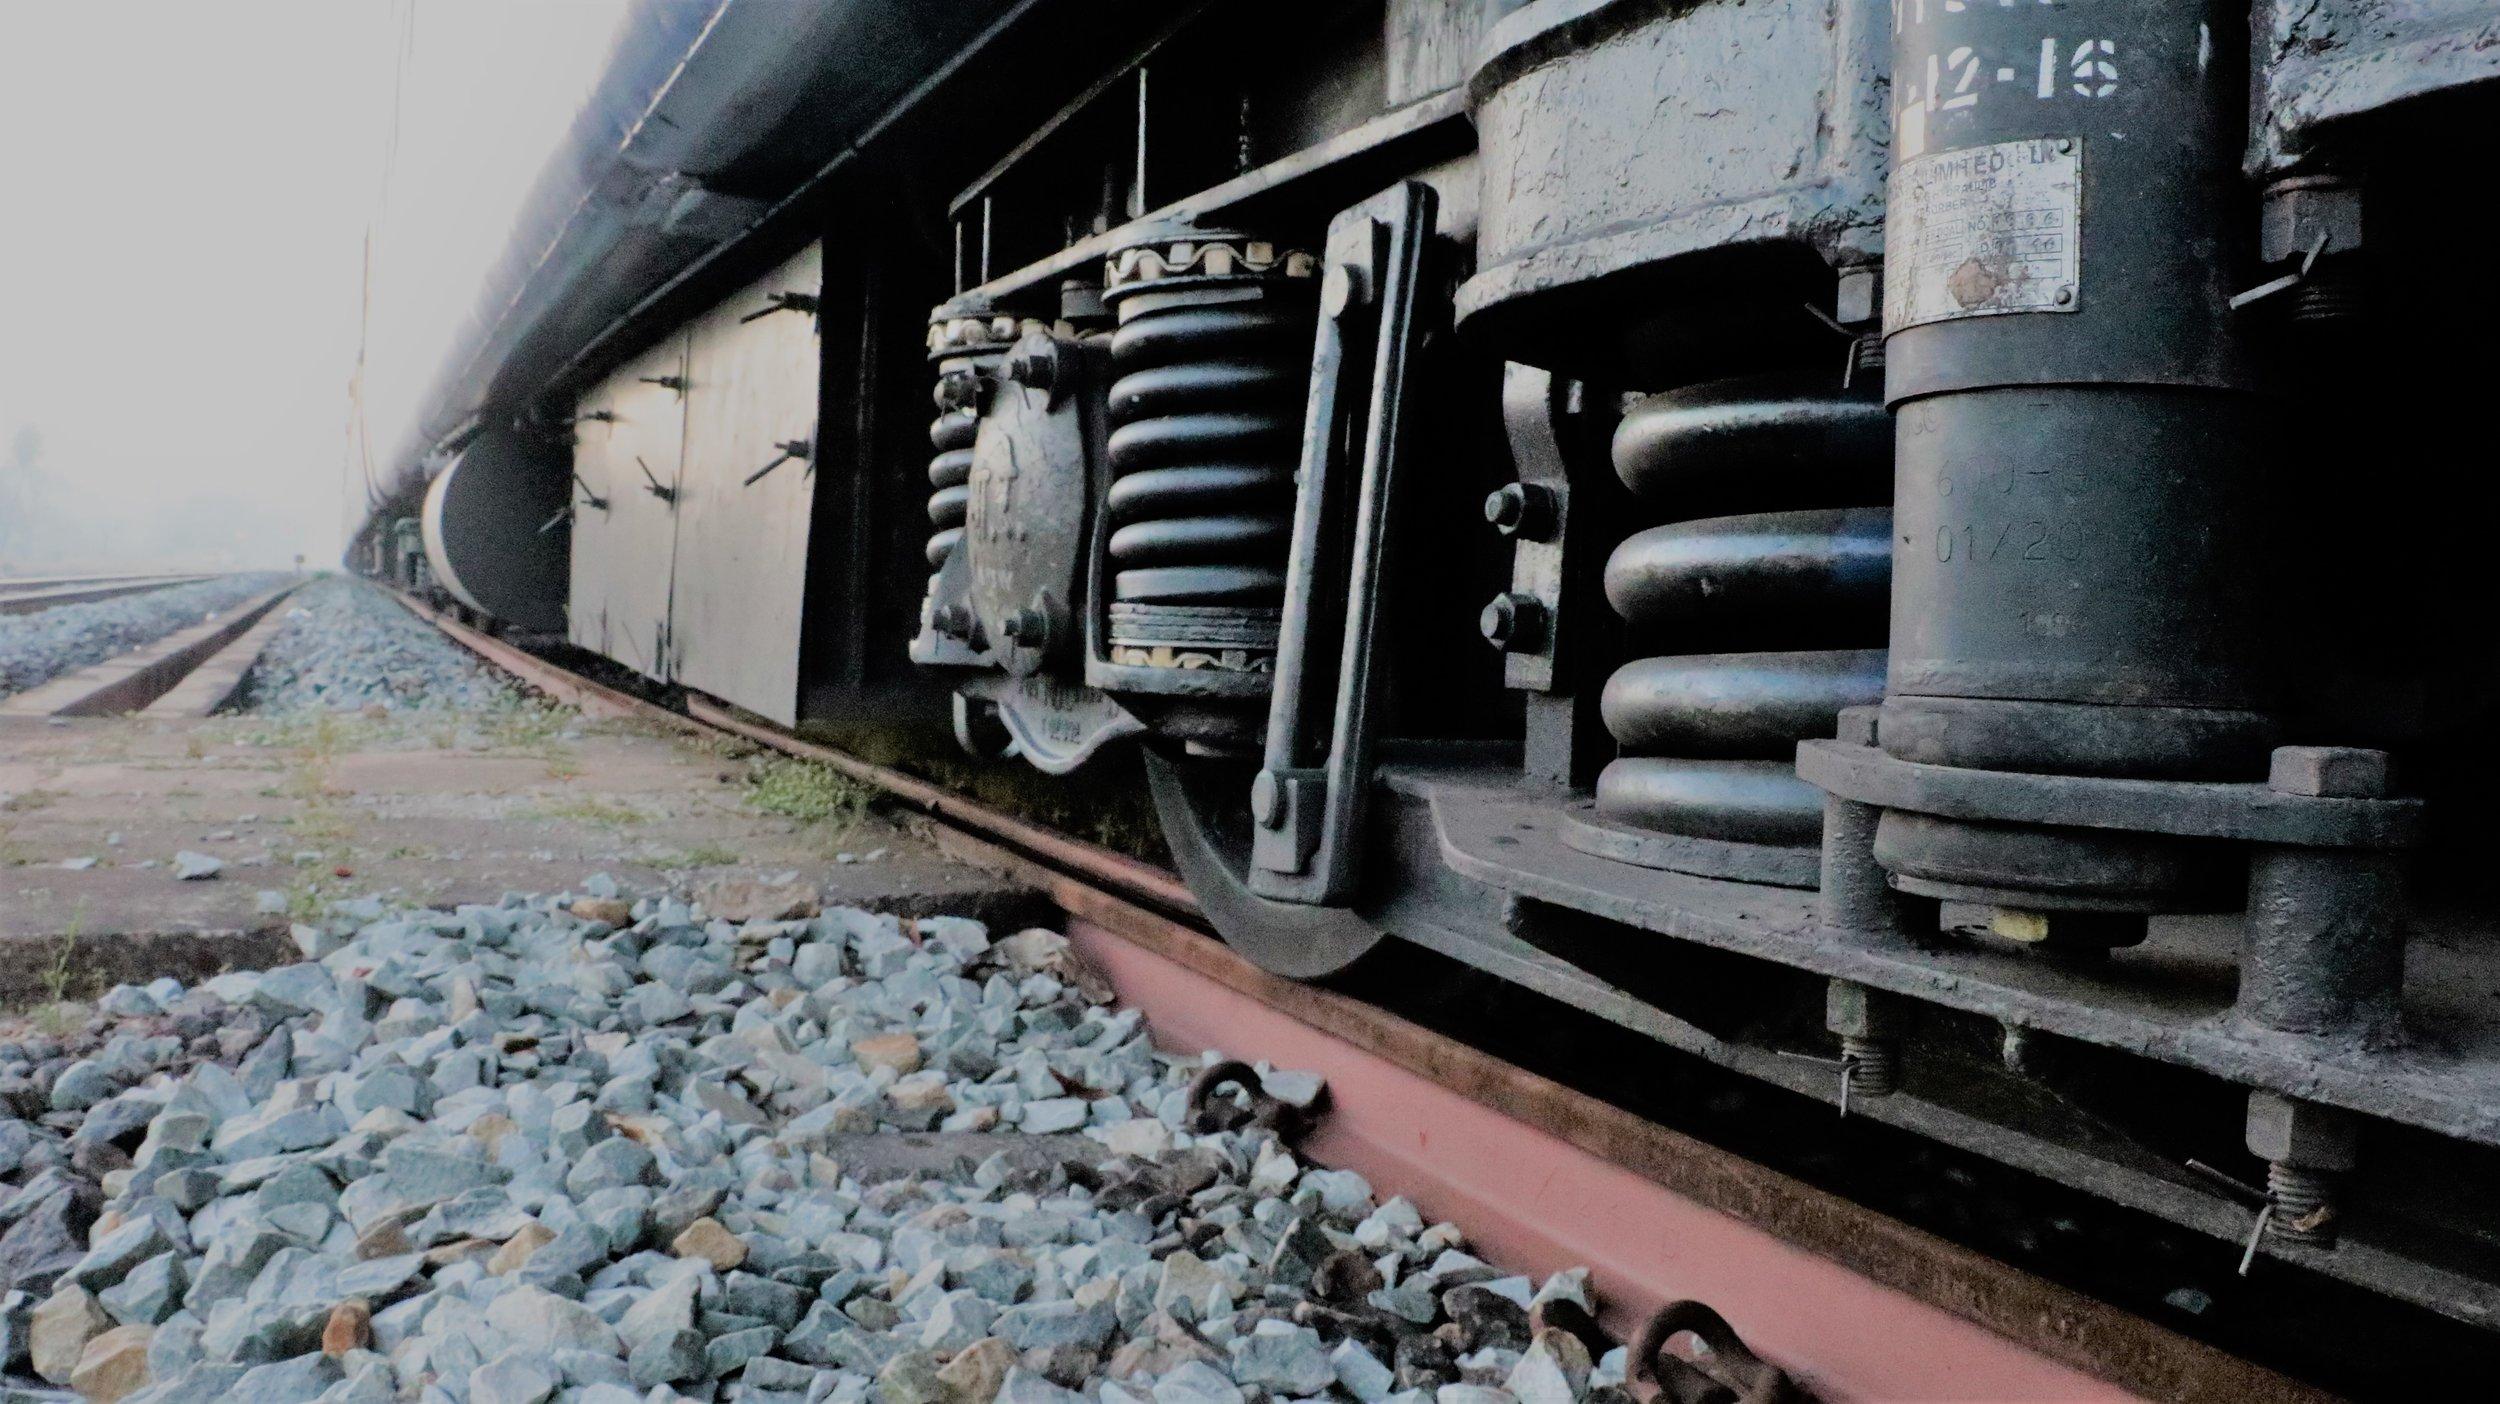 Wheels on train.jpg